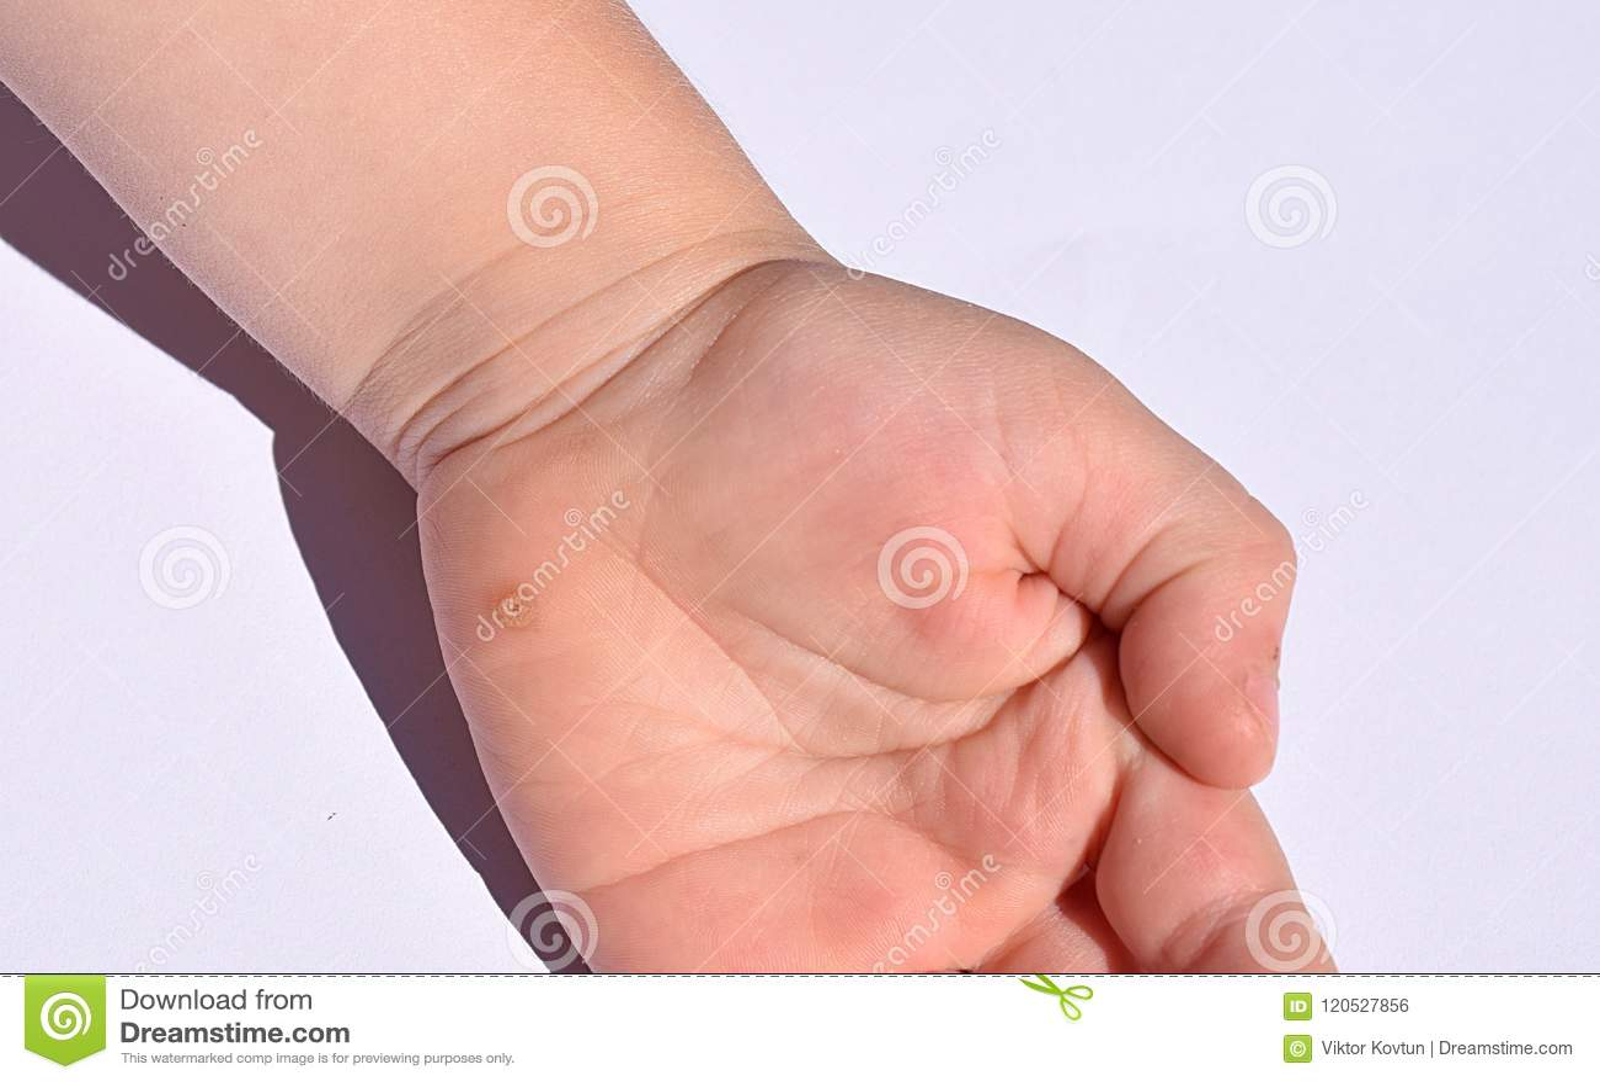 warts on hands of child medicamente pentru hpv